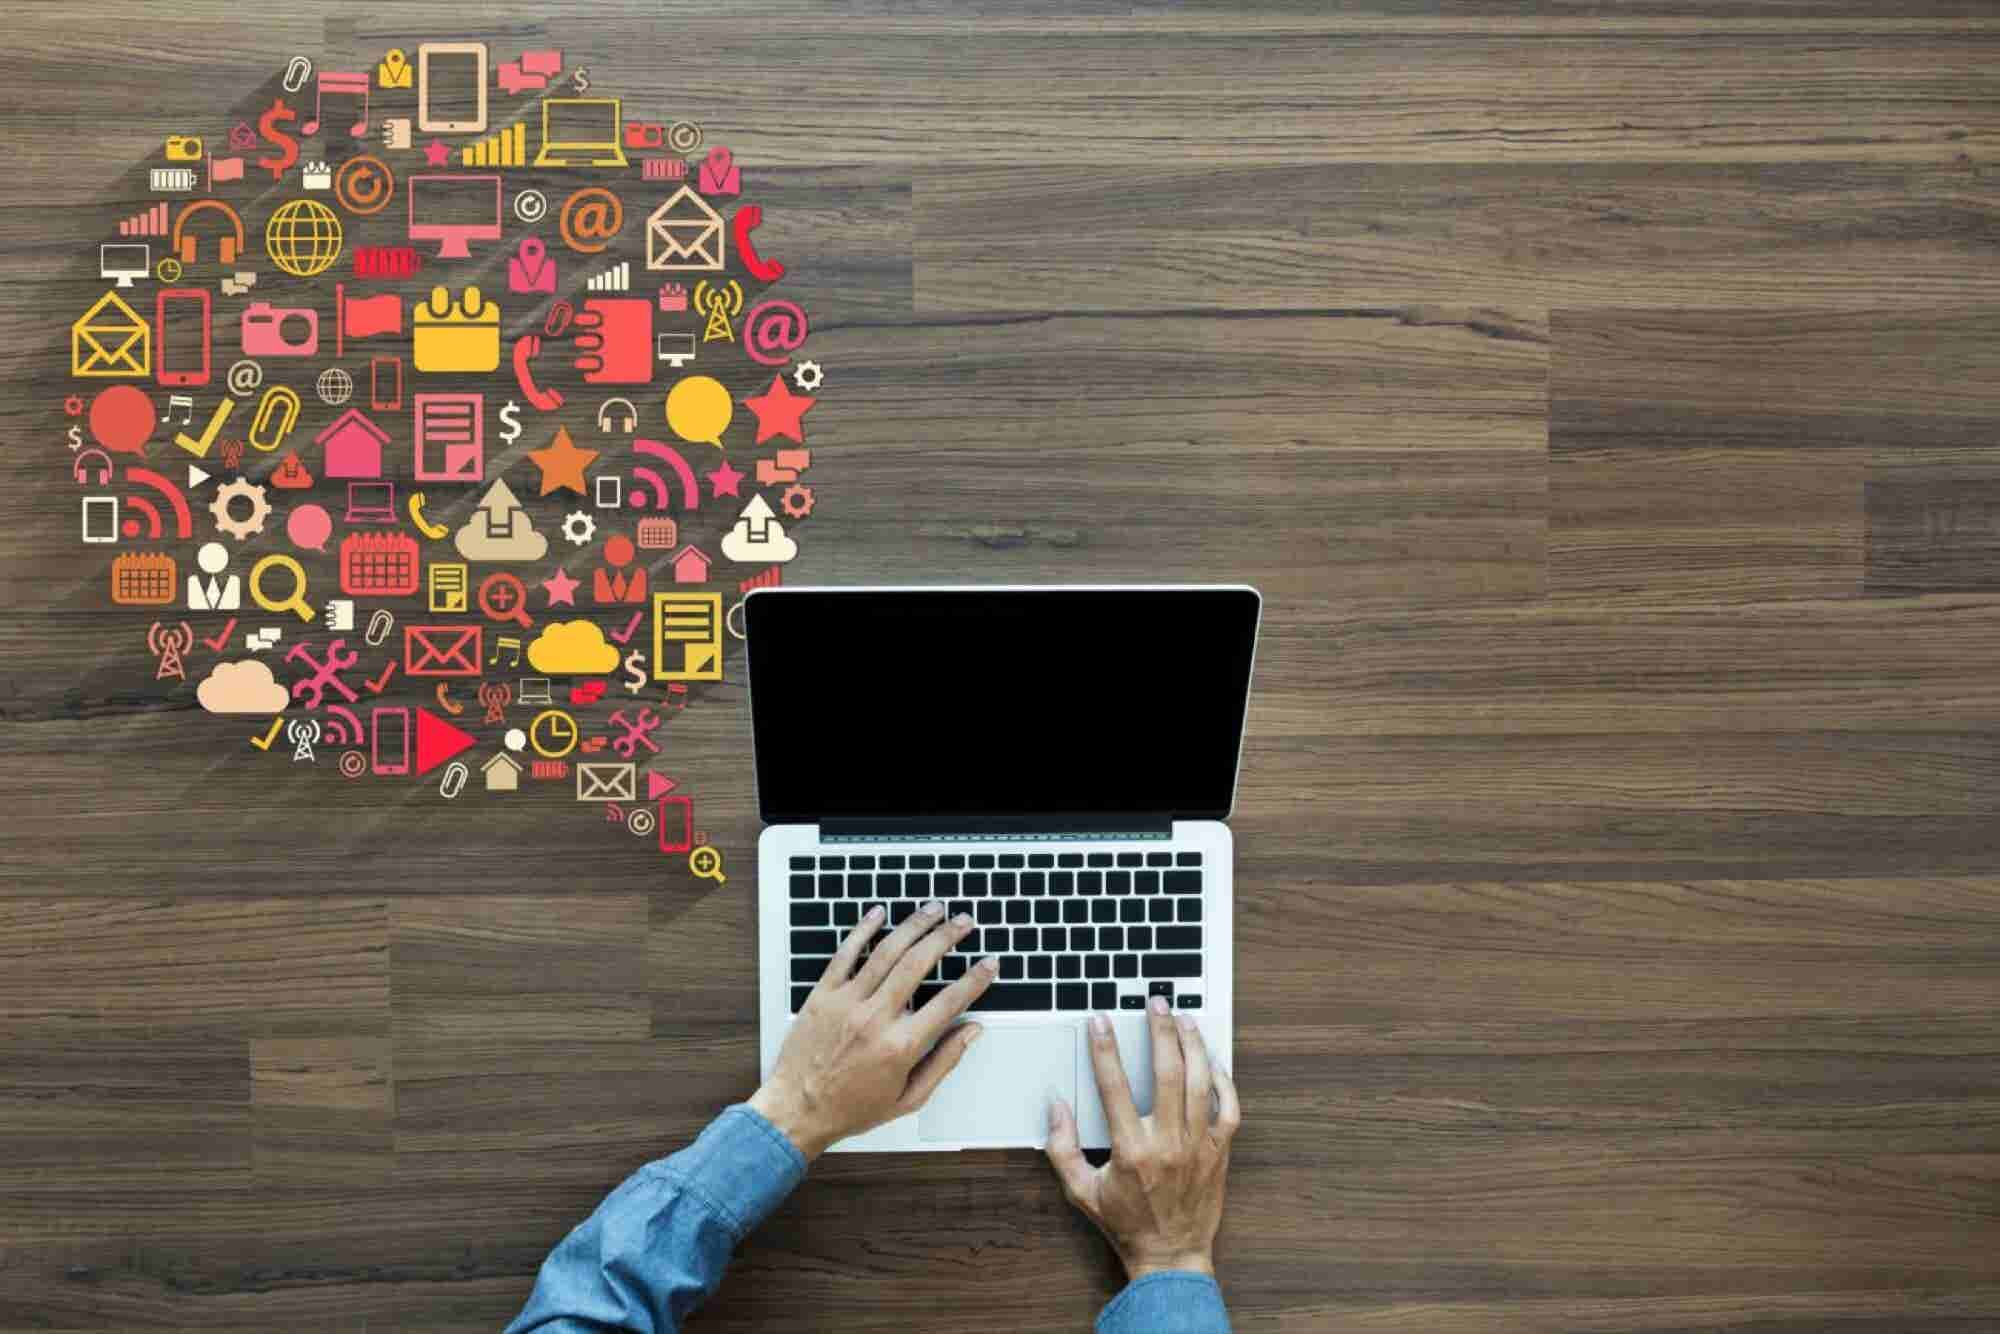 5 Crucial Ingredients of a Successful B2B Digital Marketing Strategy